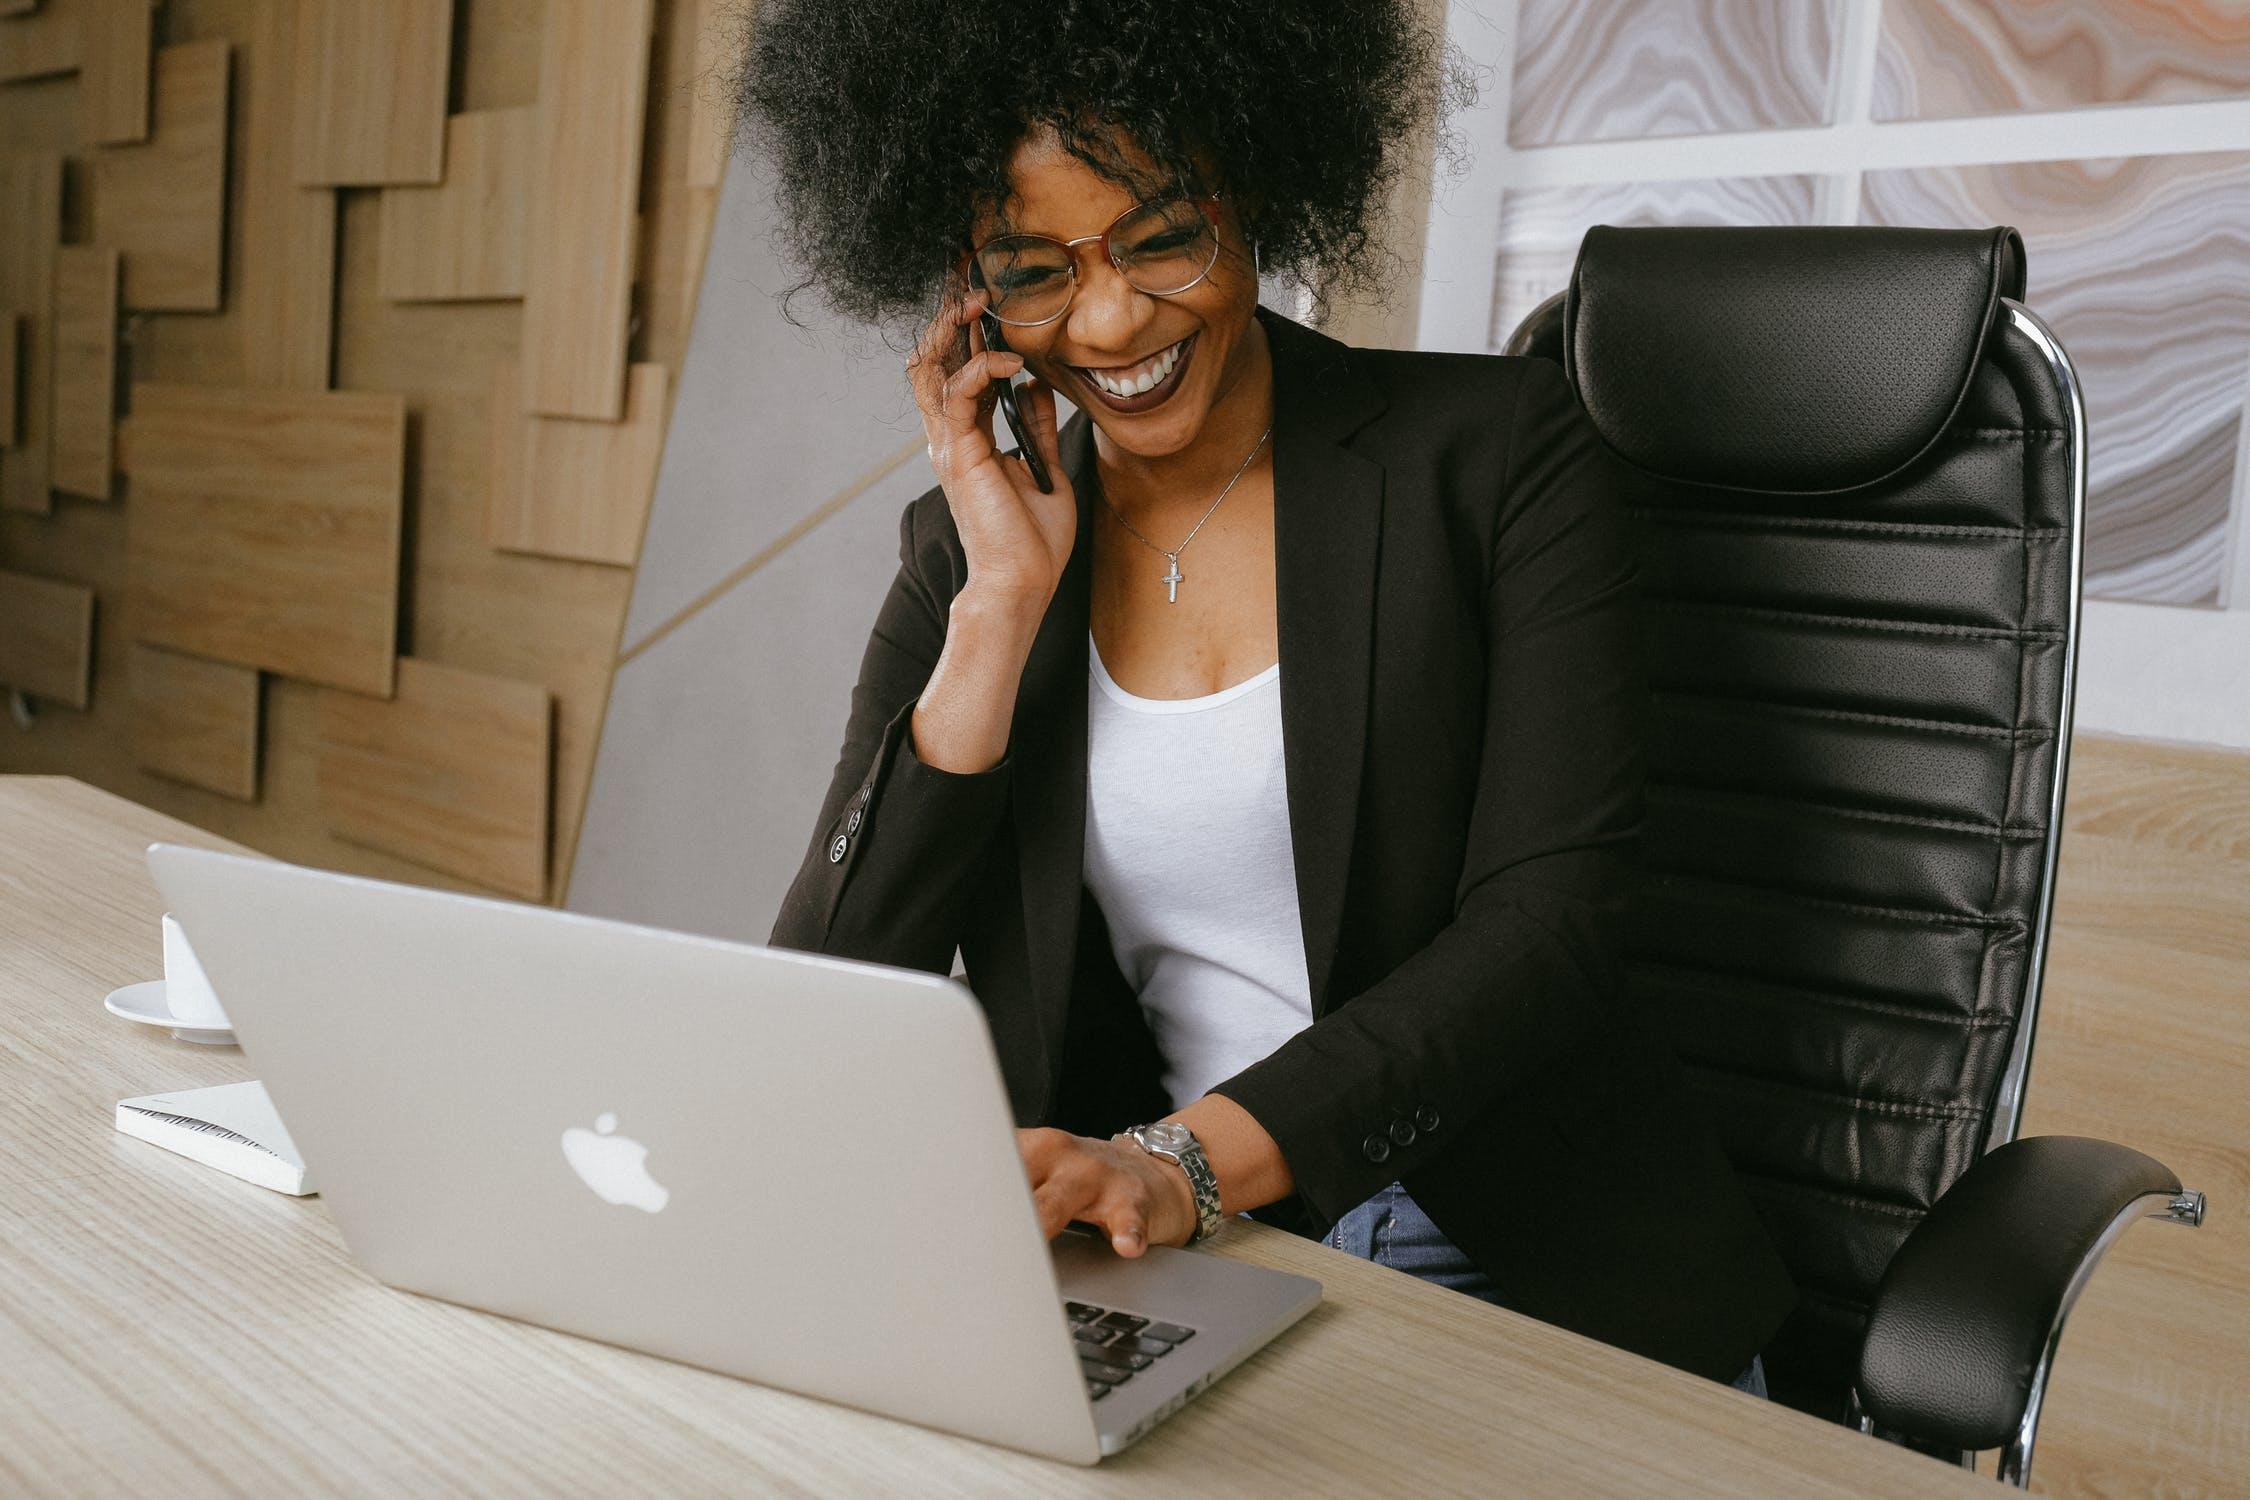 Remote Workforce Communication: No Office, No Problem.